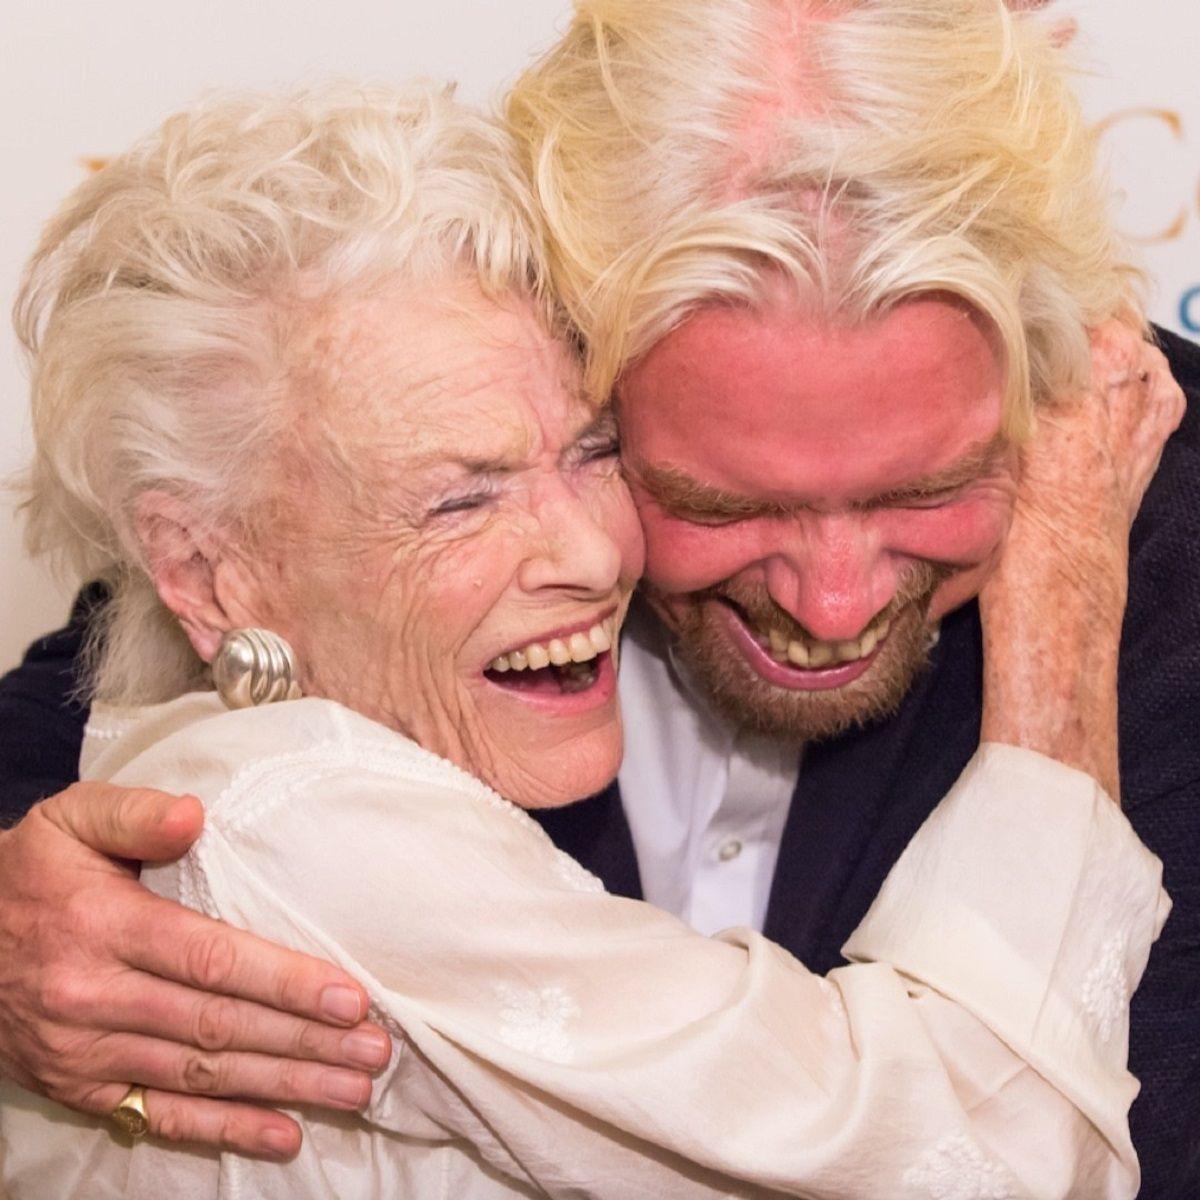 Richard Branson's mother